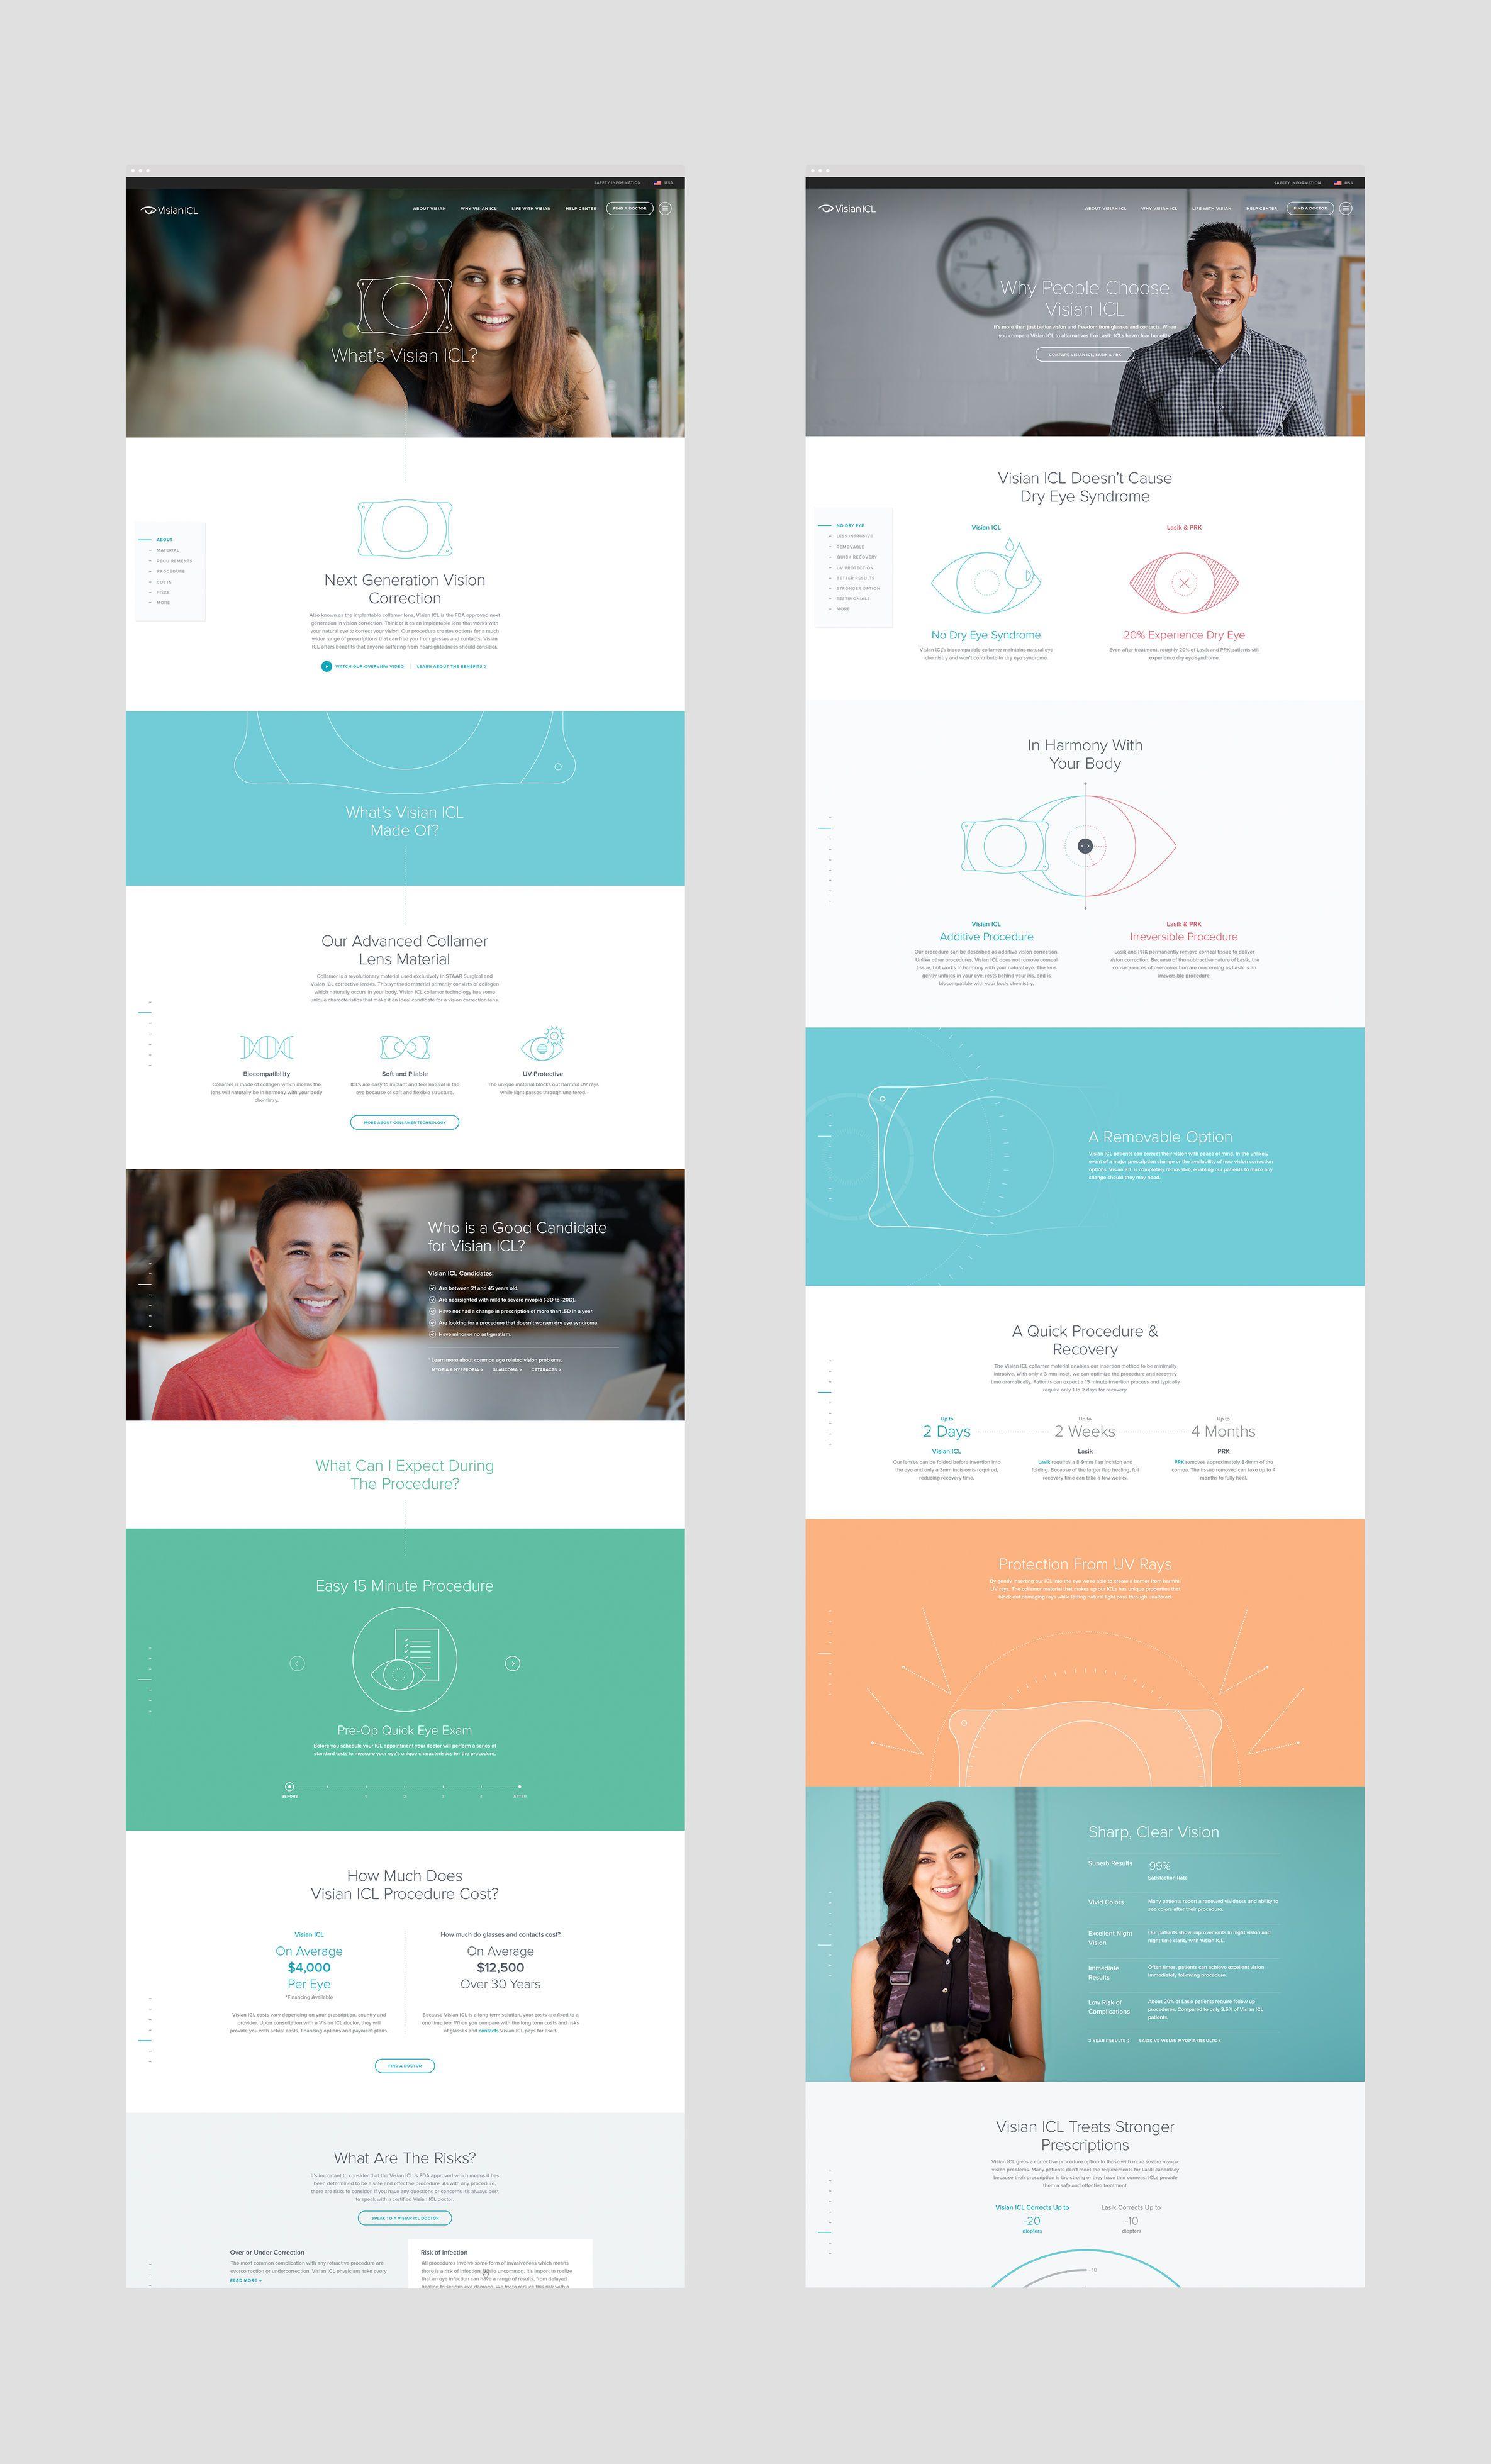 Branding Ecommerce And Design Case Studies Basic Website Design Branding Design Web Design Tips